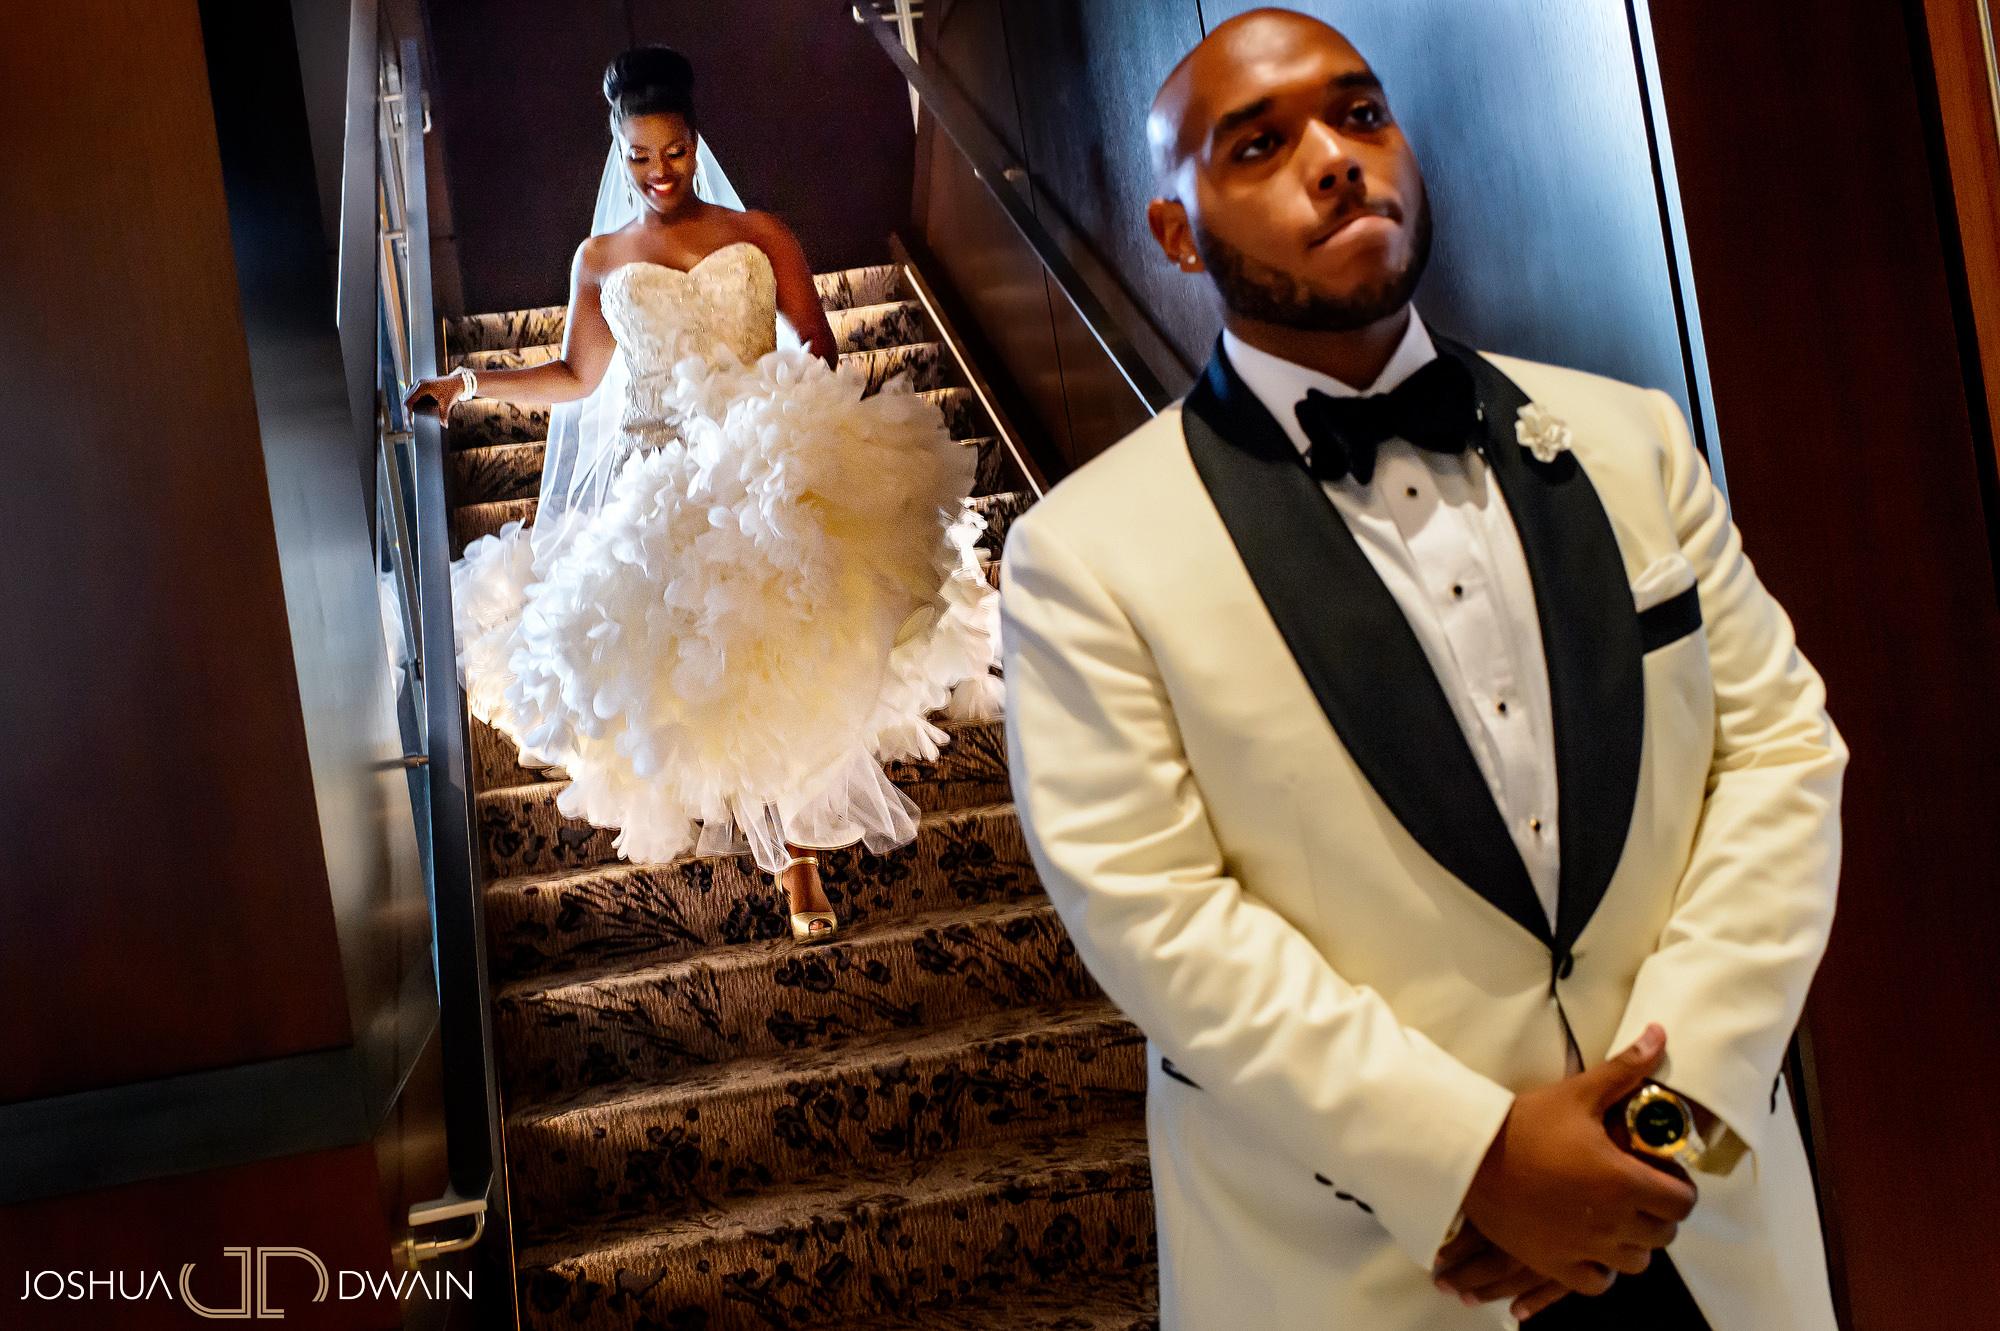 joshua-dwain-weddings-gallery-best-wedding-photographers-us-017